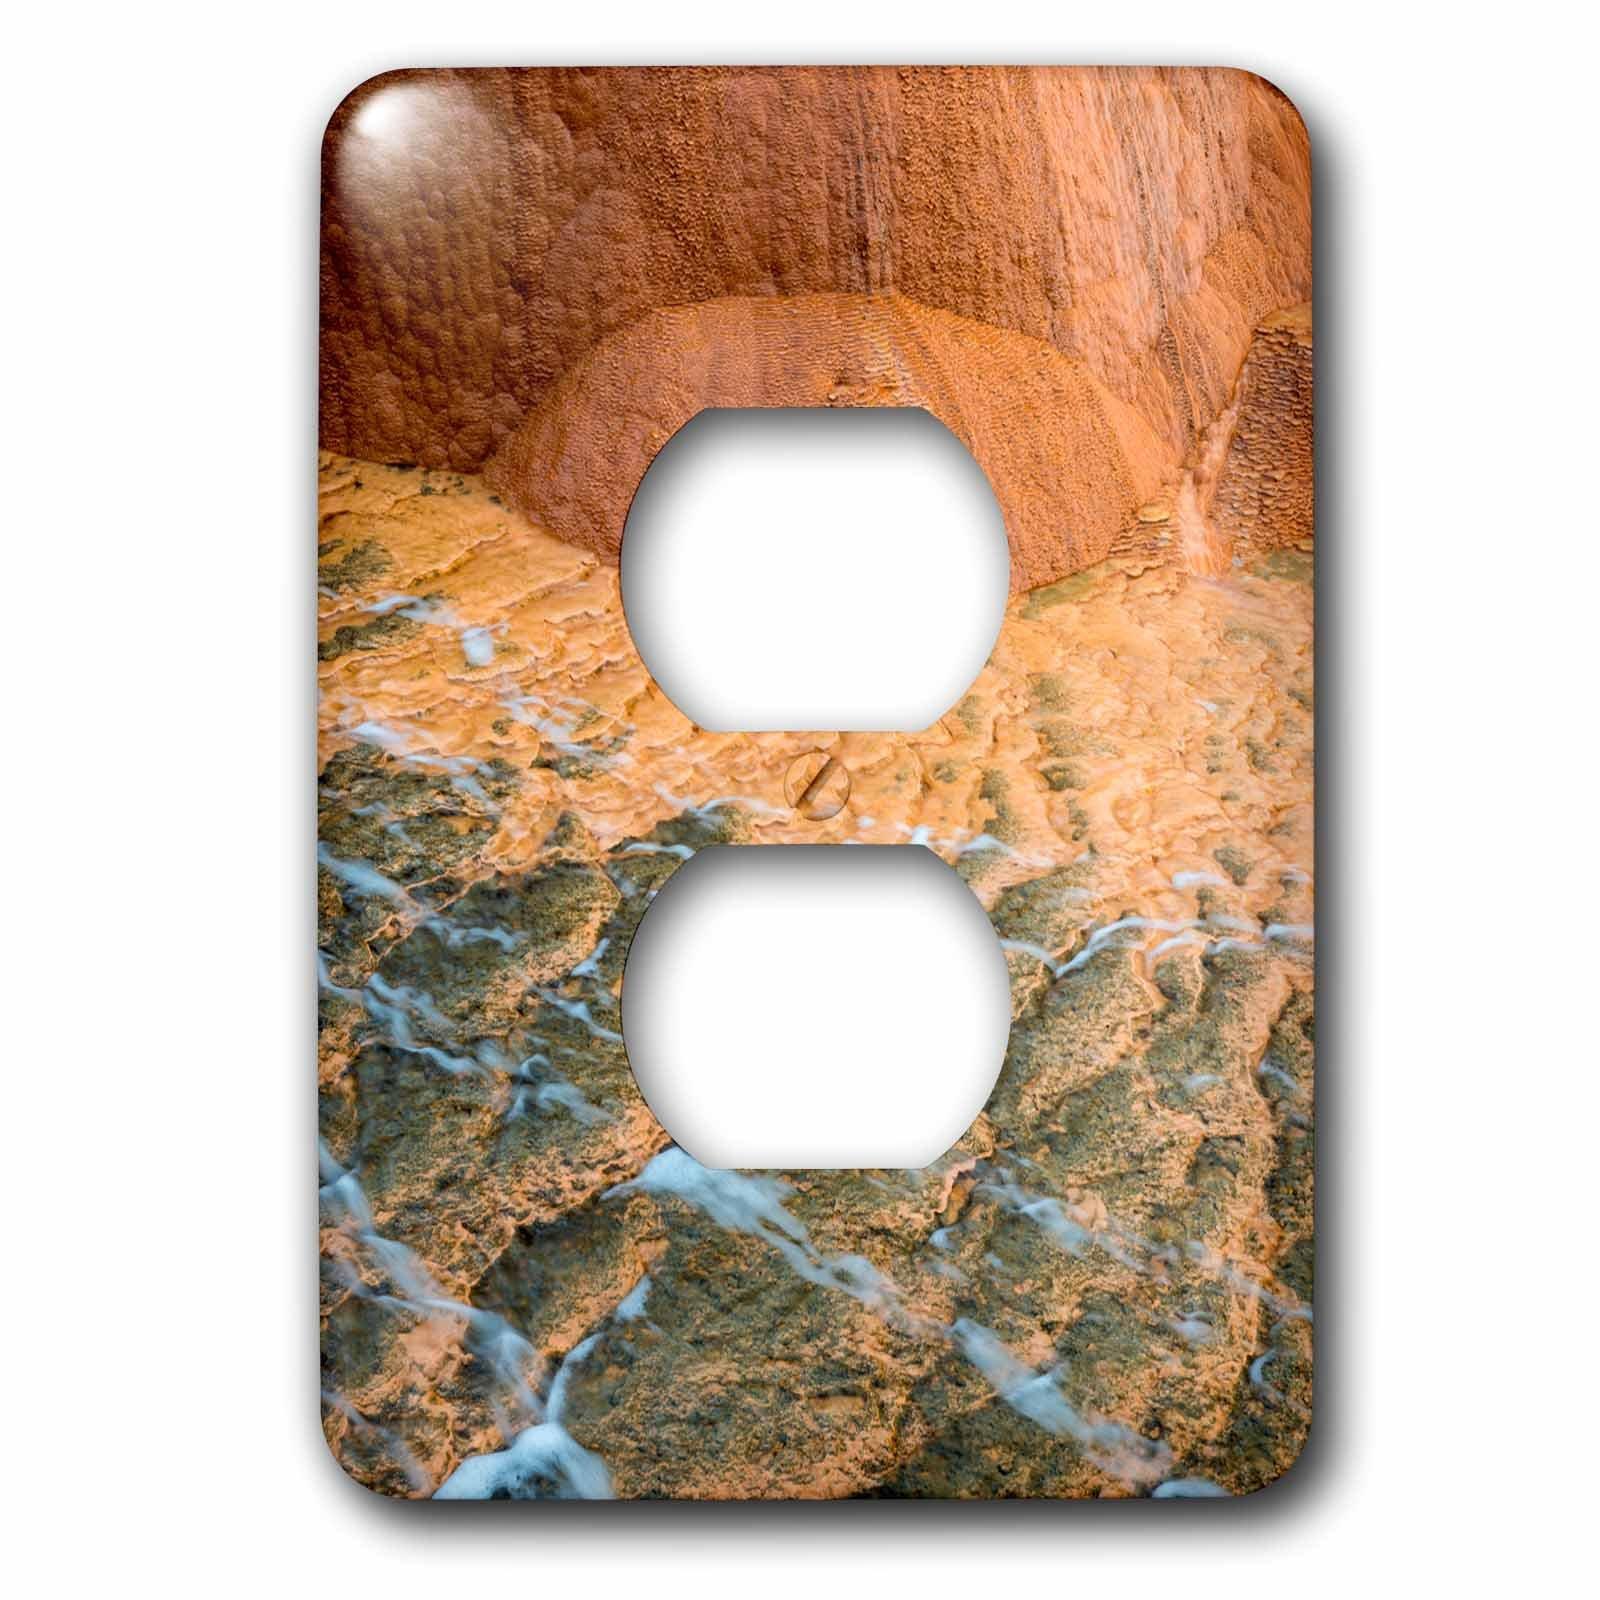 3dRose lsp_260312_6 USA, Utah. Designs Made by Travertine Deposits At Crystal Geyser Plug Outlet Cover, Multicolor